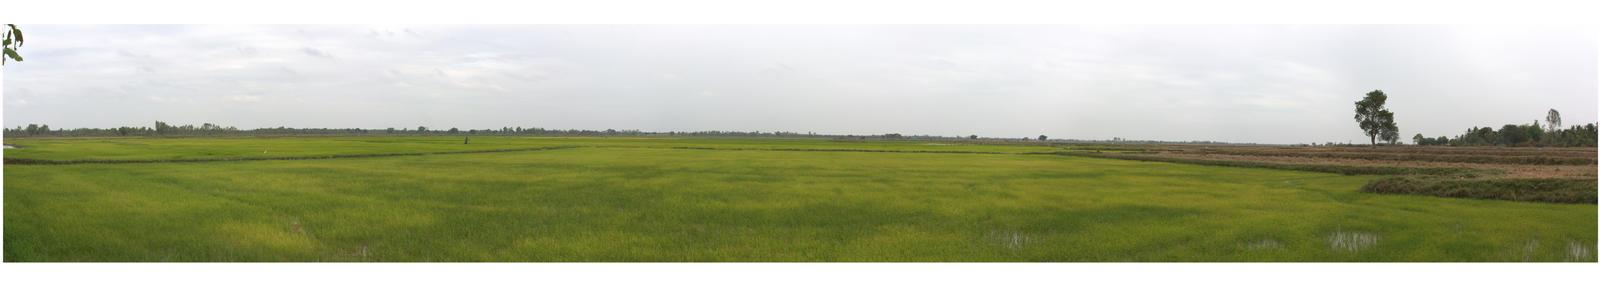 Thai Rice Paddies by Mylniar